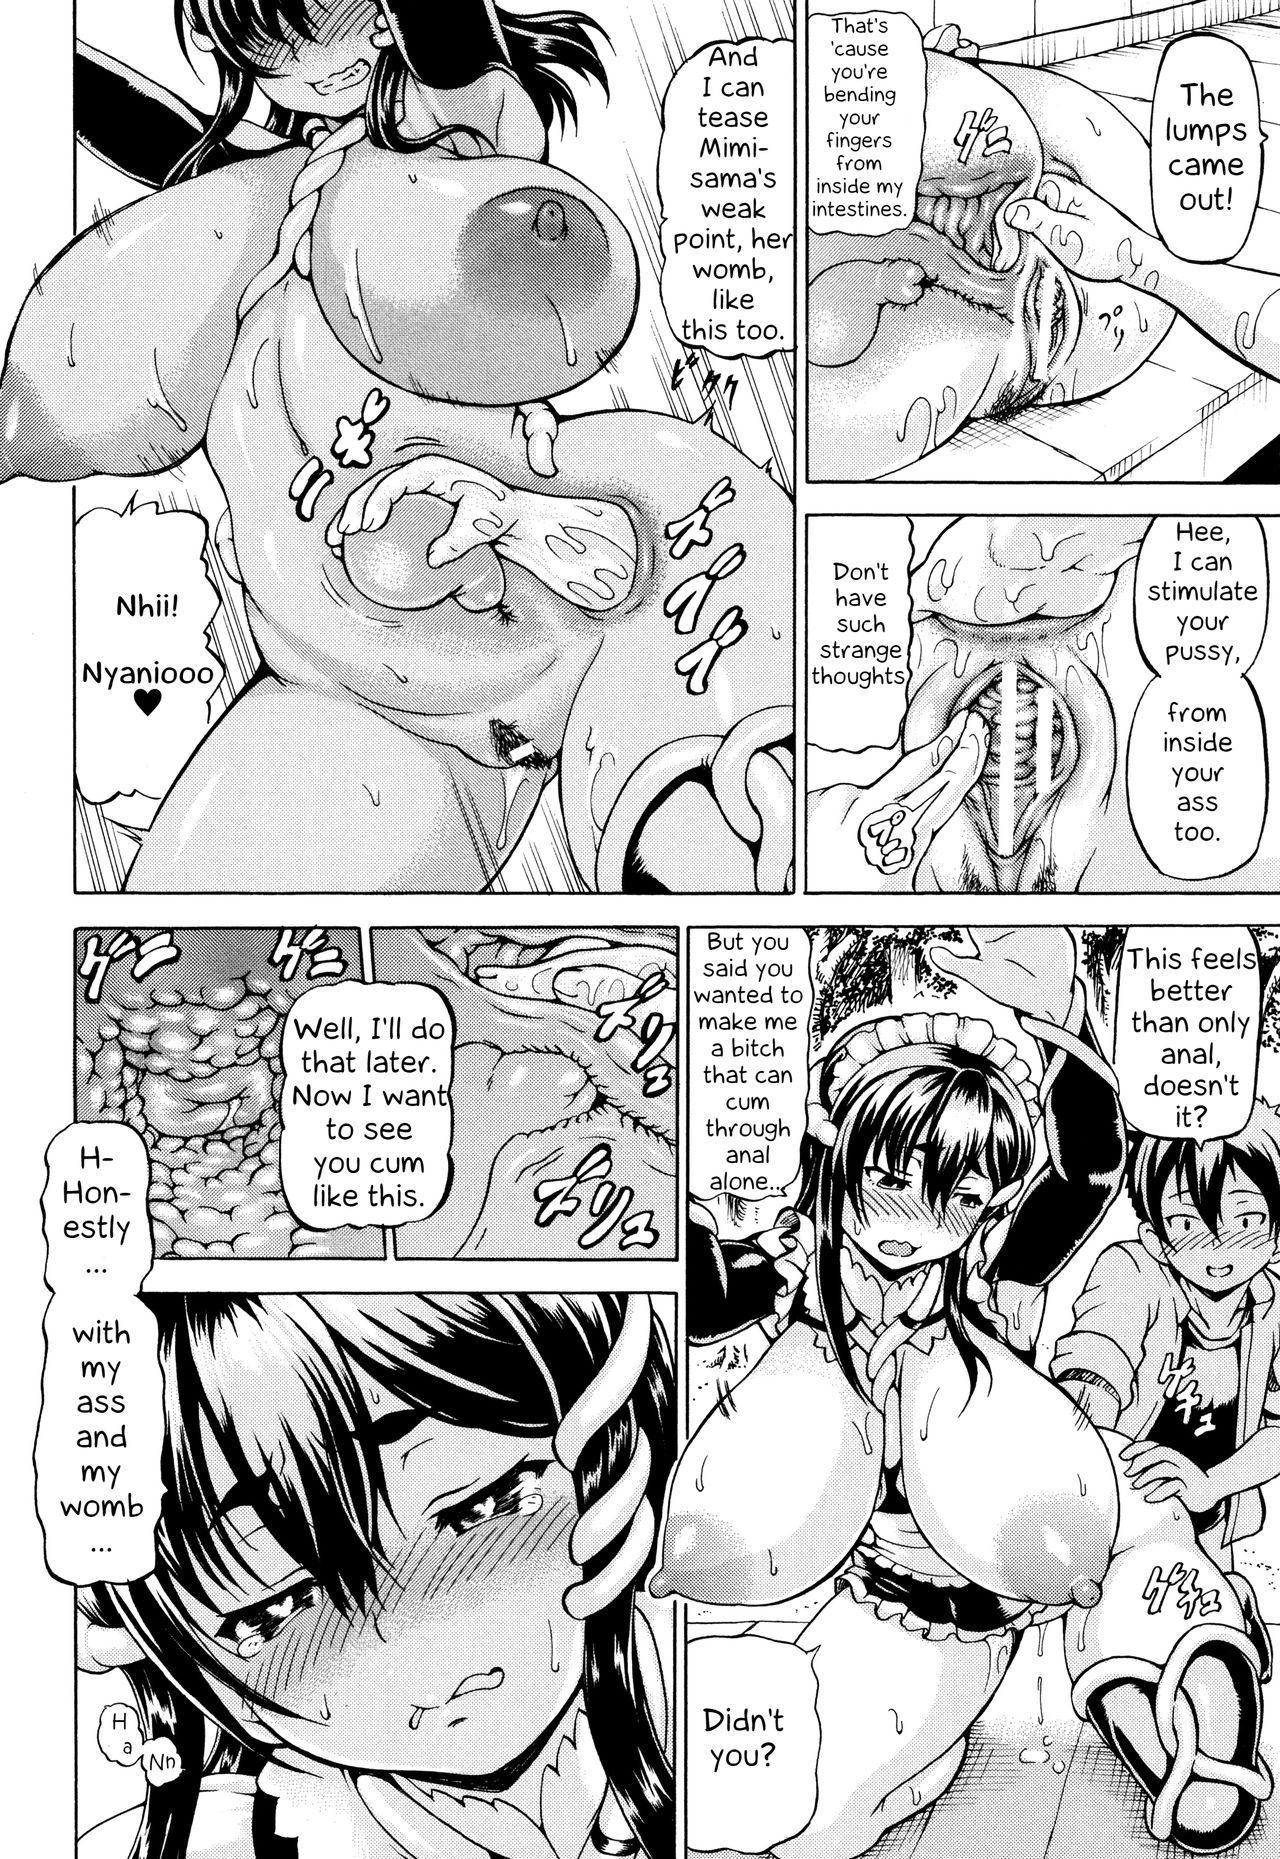 [Shiina Kazuki] Mimi-sama Okkiku Shite! - Mimi... Make me Big! | Mimi-sama make me Big! Ch. 1-3, 10 [English] [EHCove] 39